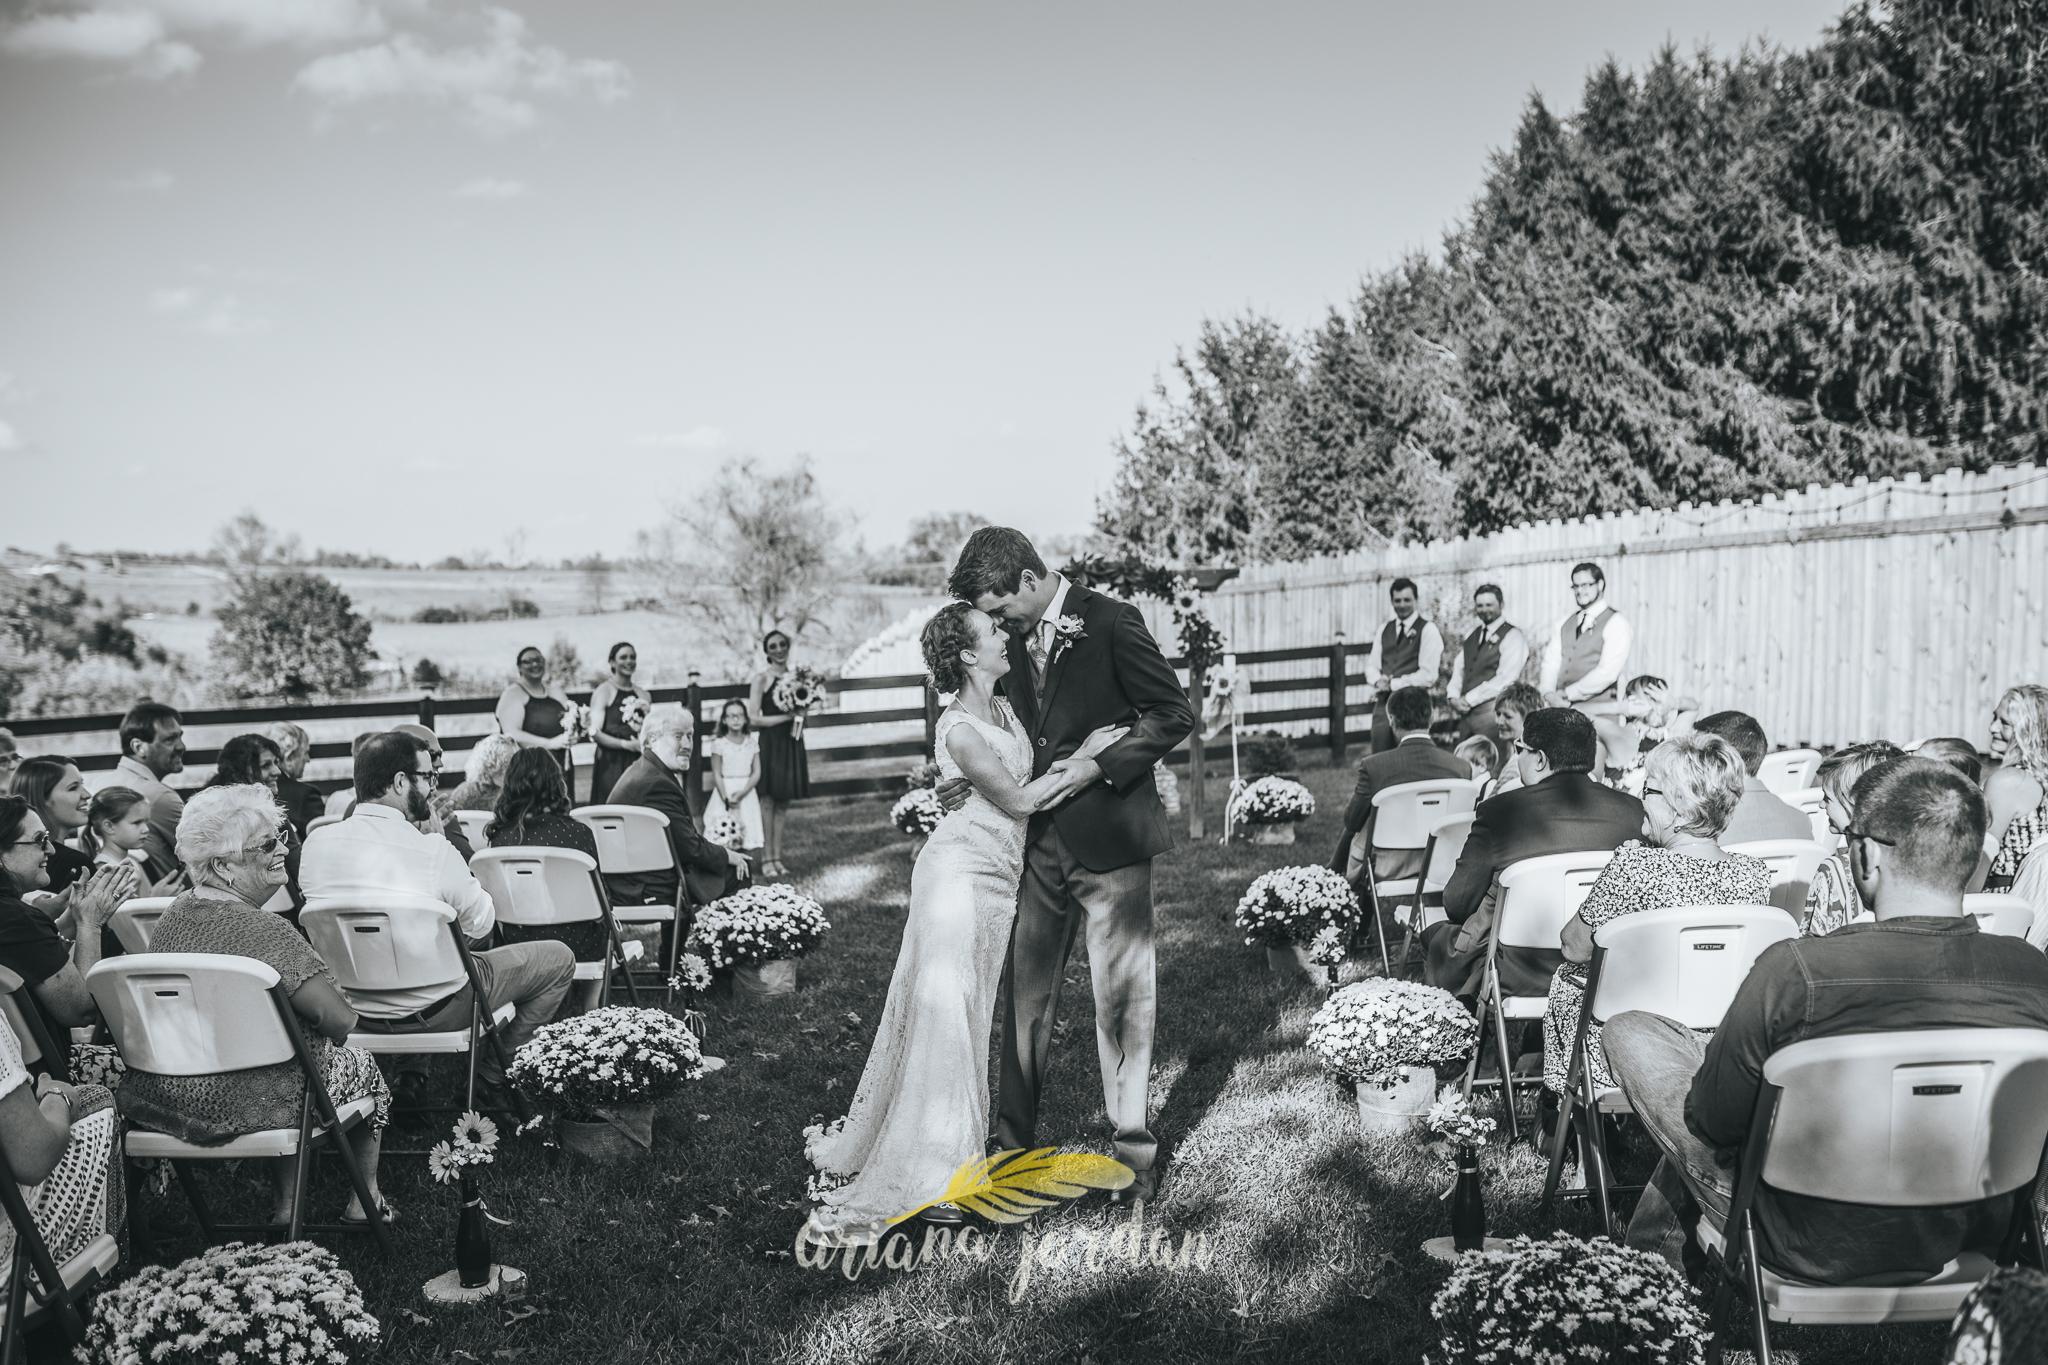 082 Ariana Jordan Photography -Moonlight Fields Lexington Ky Wedding Photographer 1564.jpg